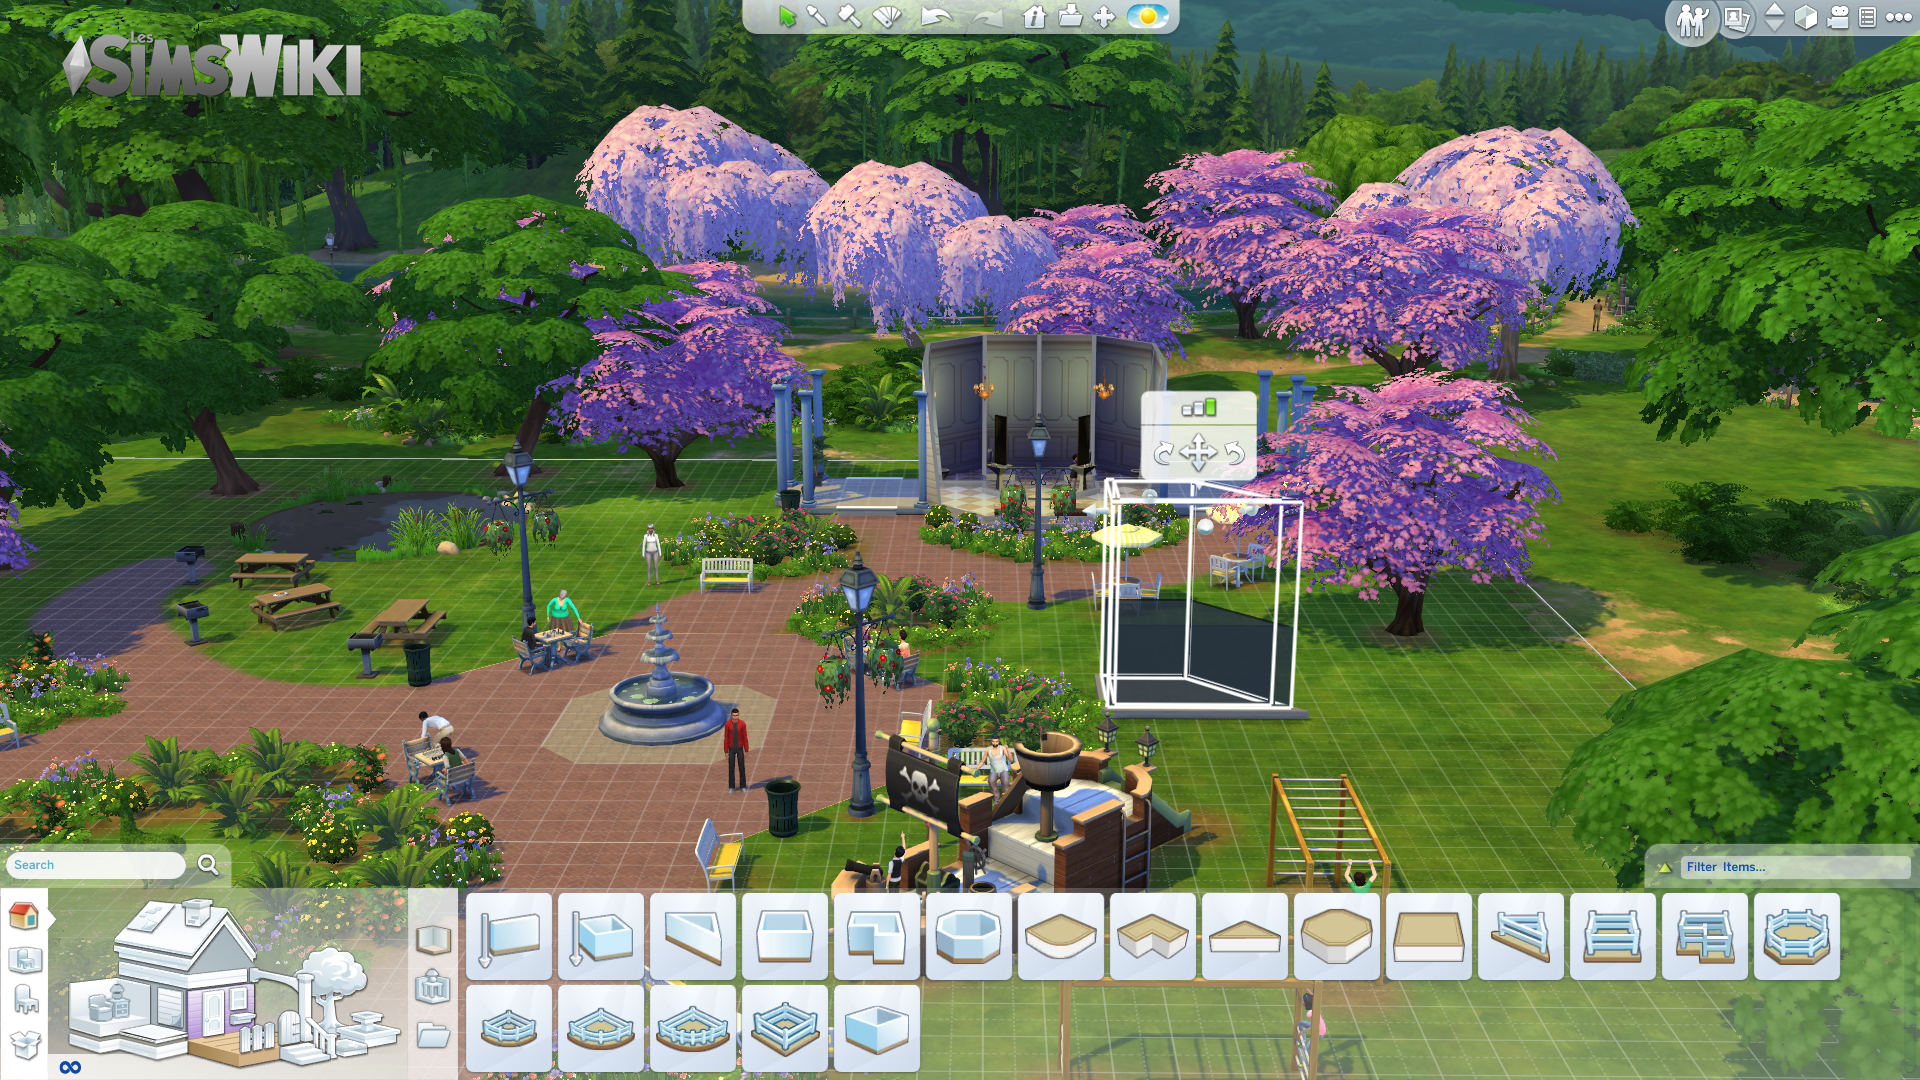 Juleski/Gamescom 2014 - Les Sims 4 - Le mode construction